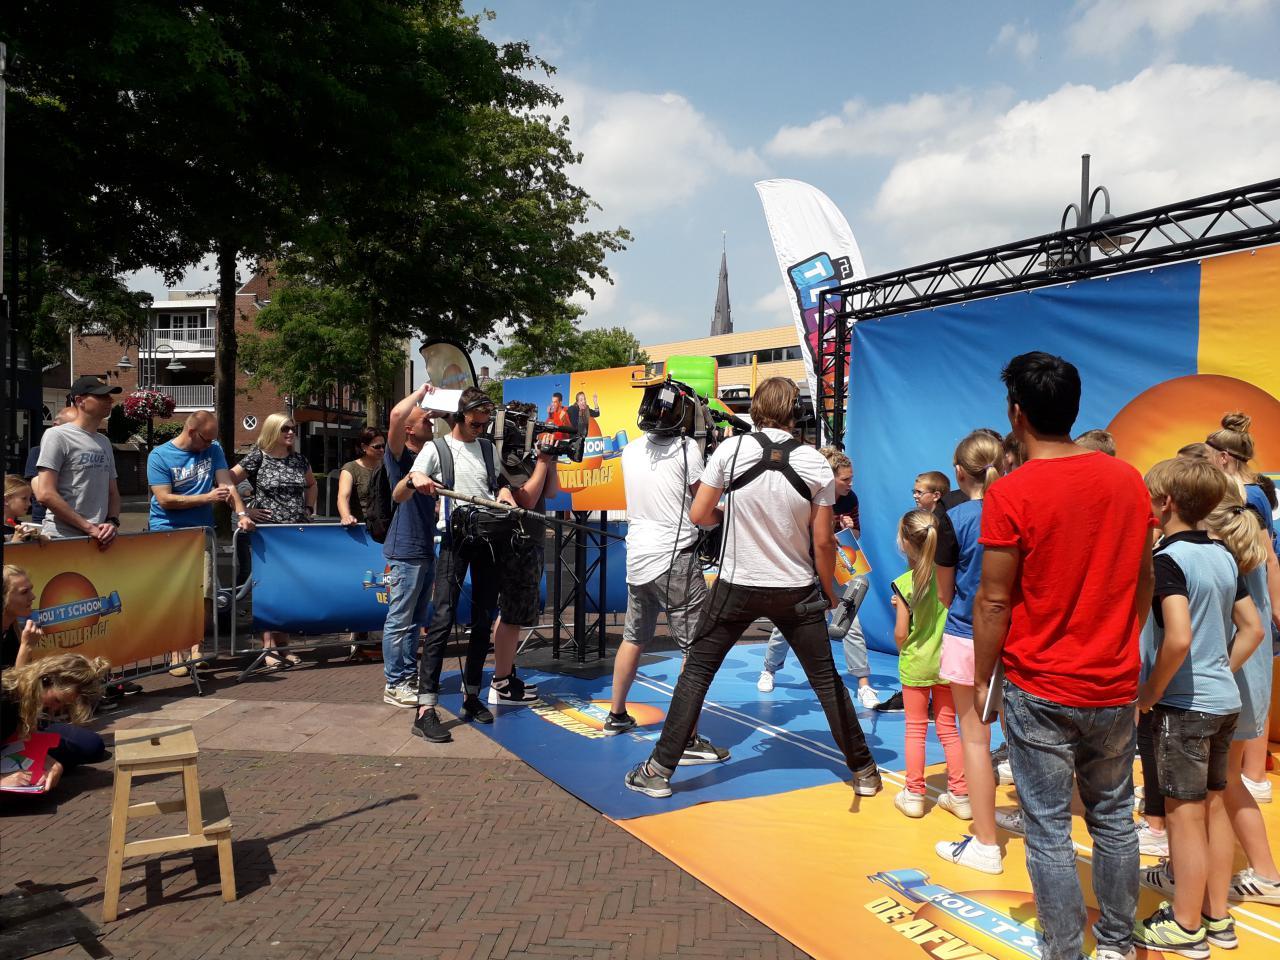 RTL Telekids Hou 't schoon